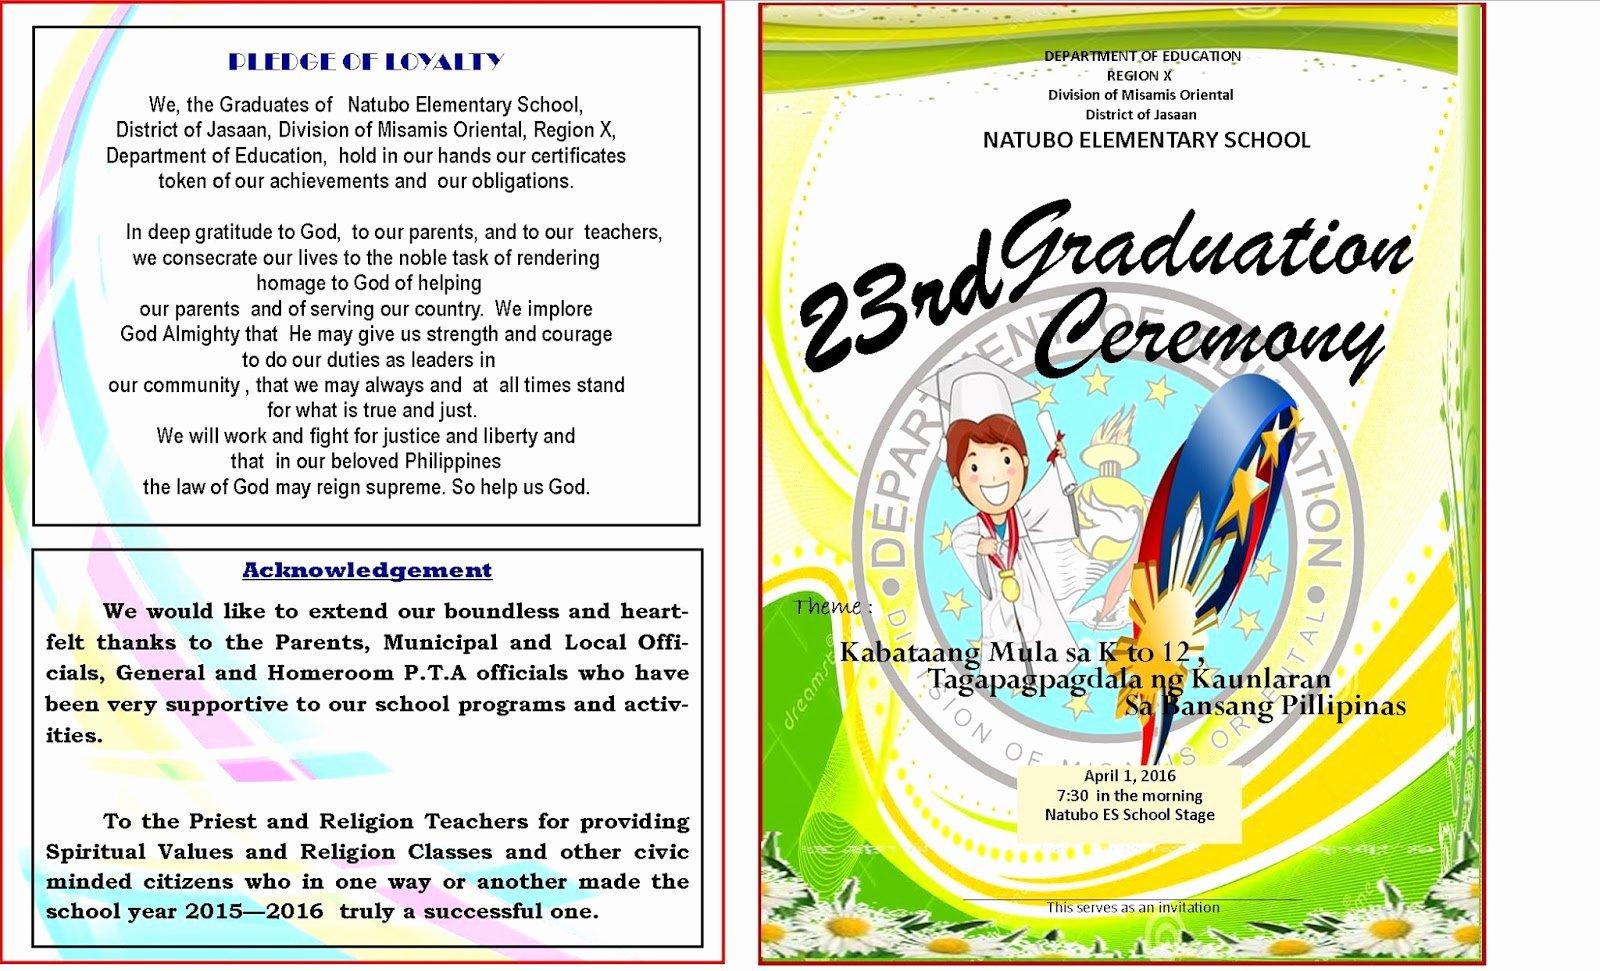 Preschool Graduation Program Template Lovely 2015 2016 Graduation Program New Template Deped Lp S